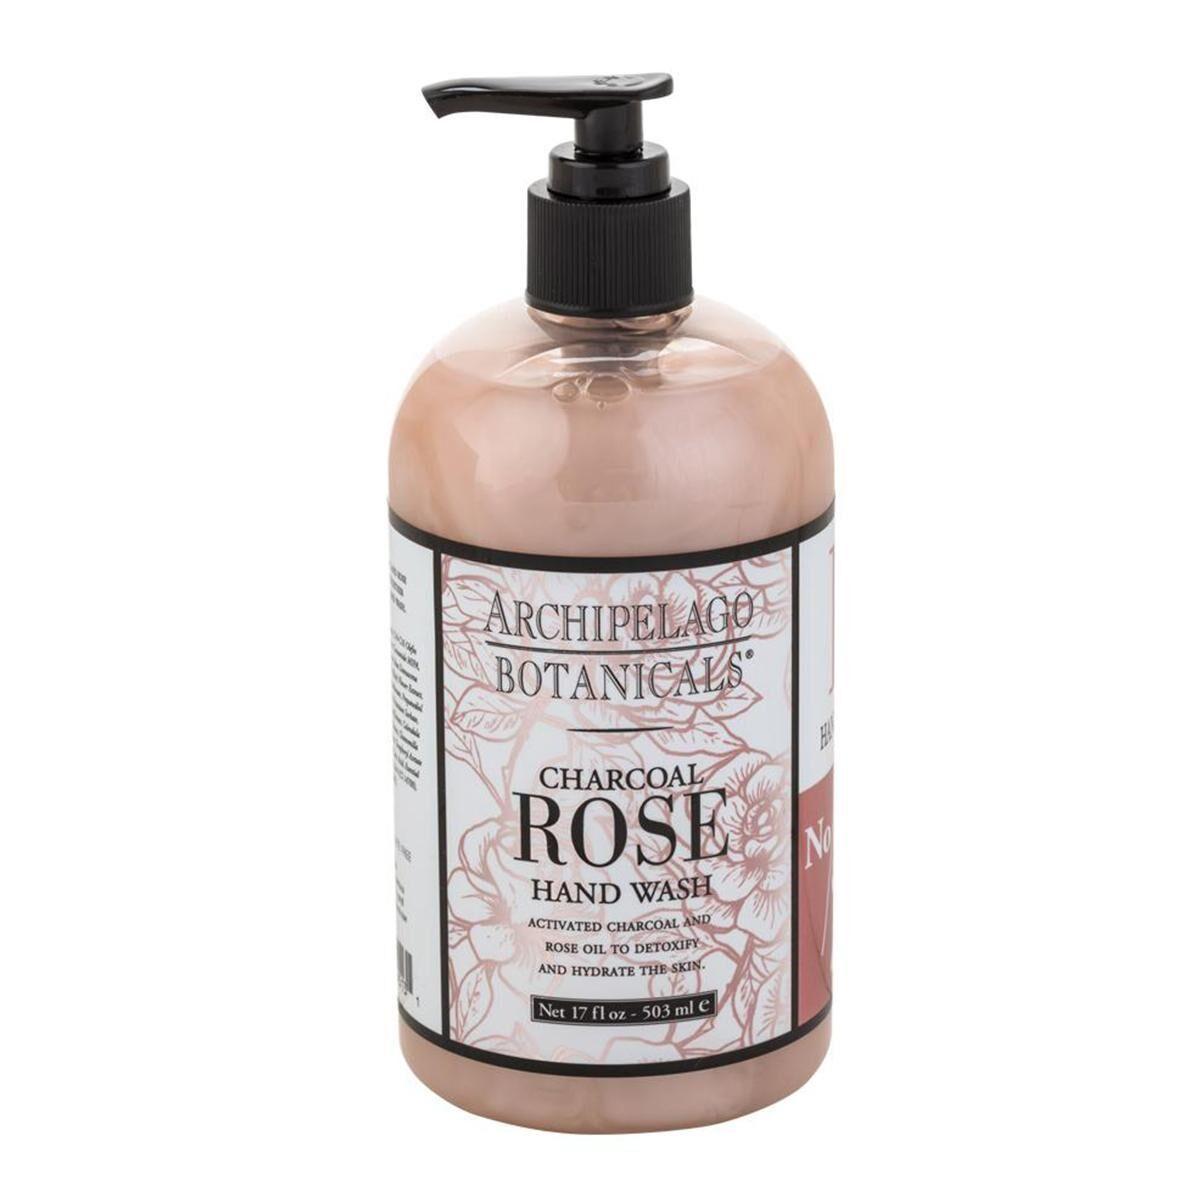 Archipelago Botanicals - Charcoal Rose Hand Wash